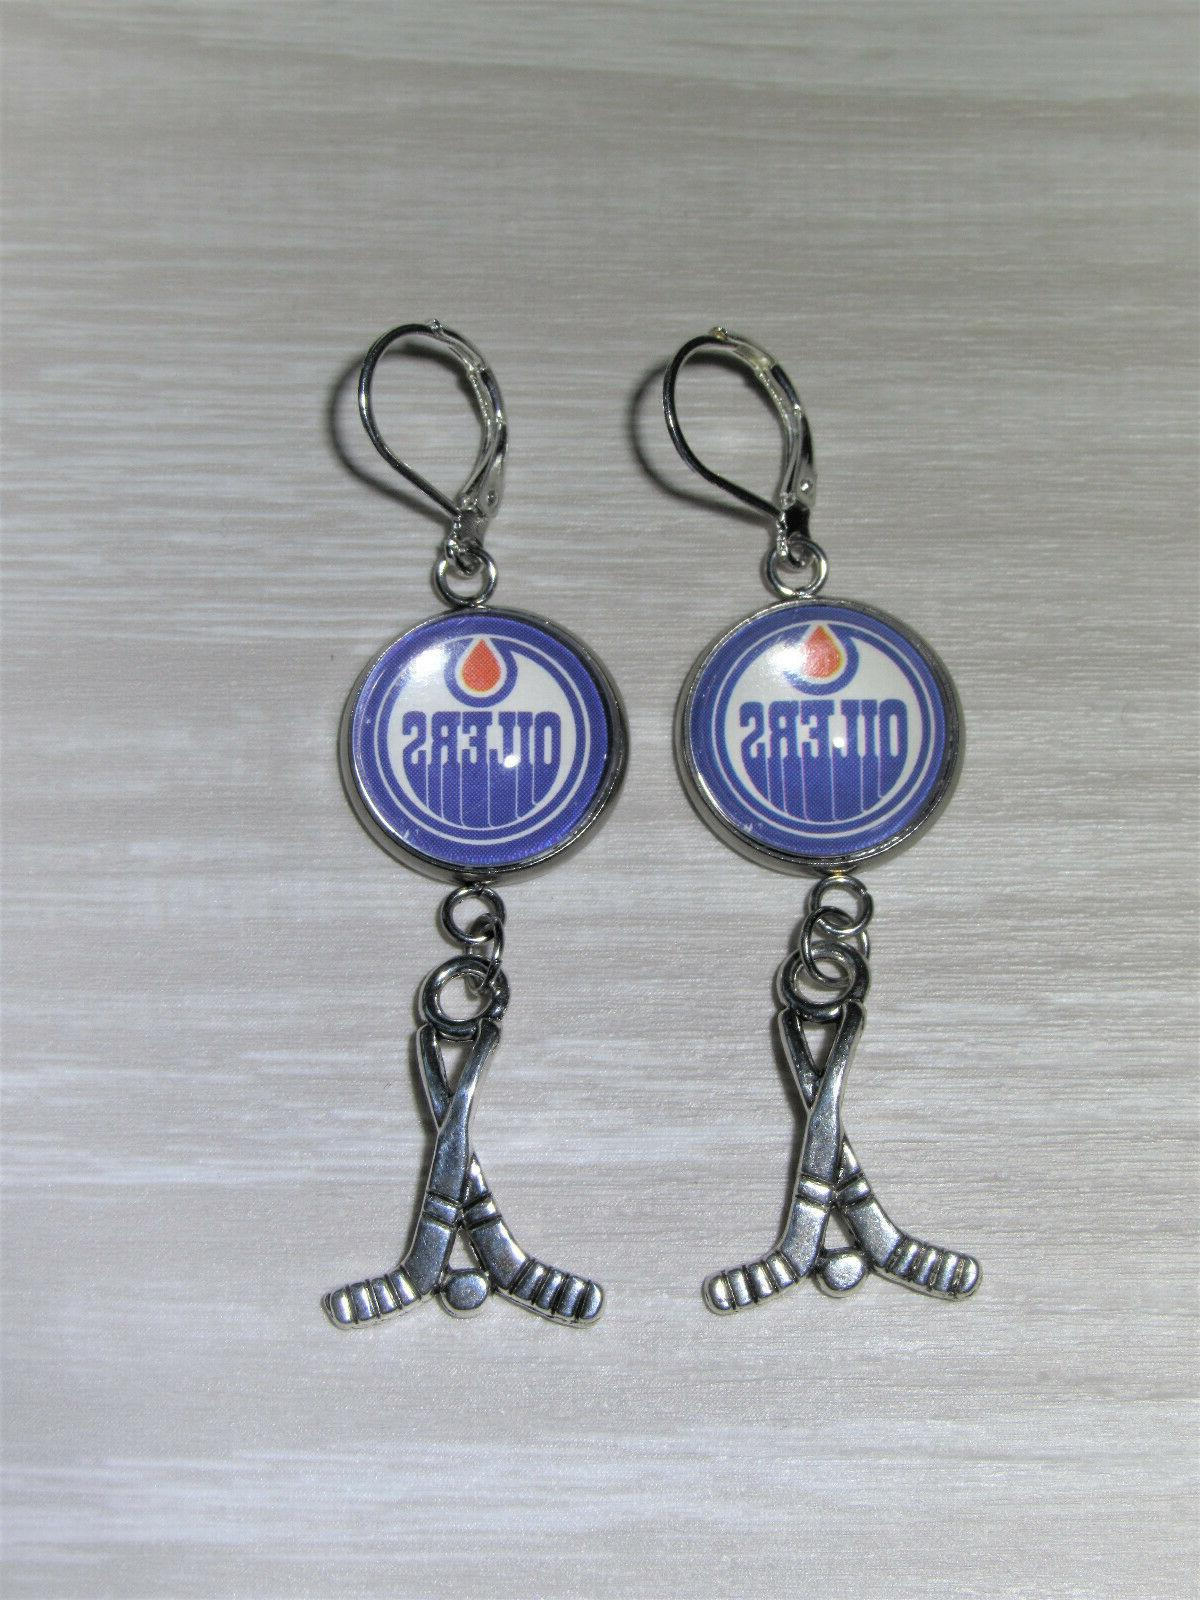 edmonton oilers earrings w hockey charm made